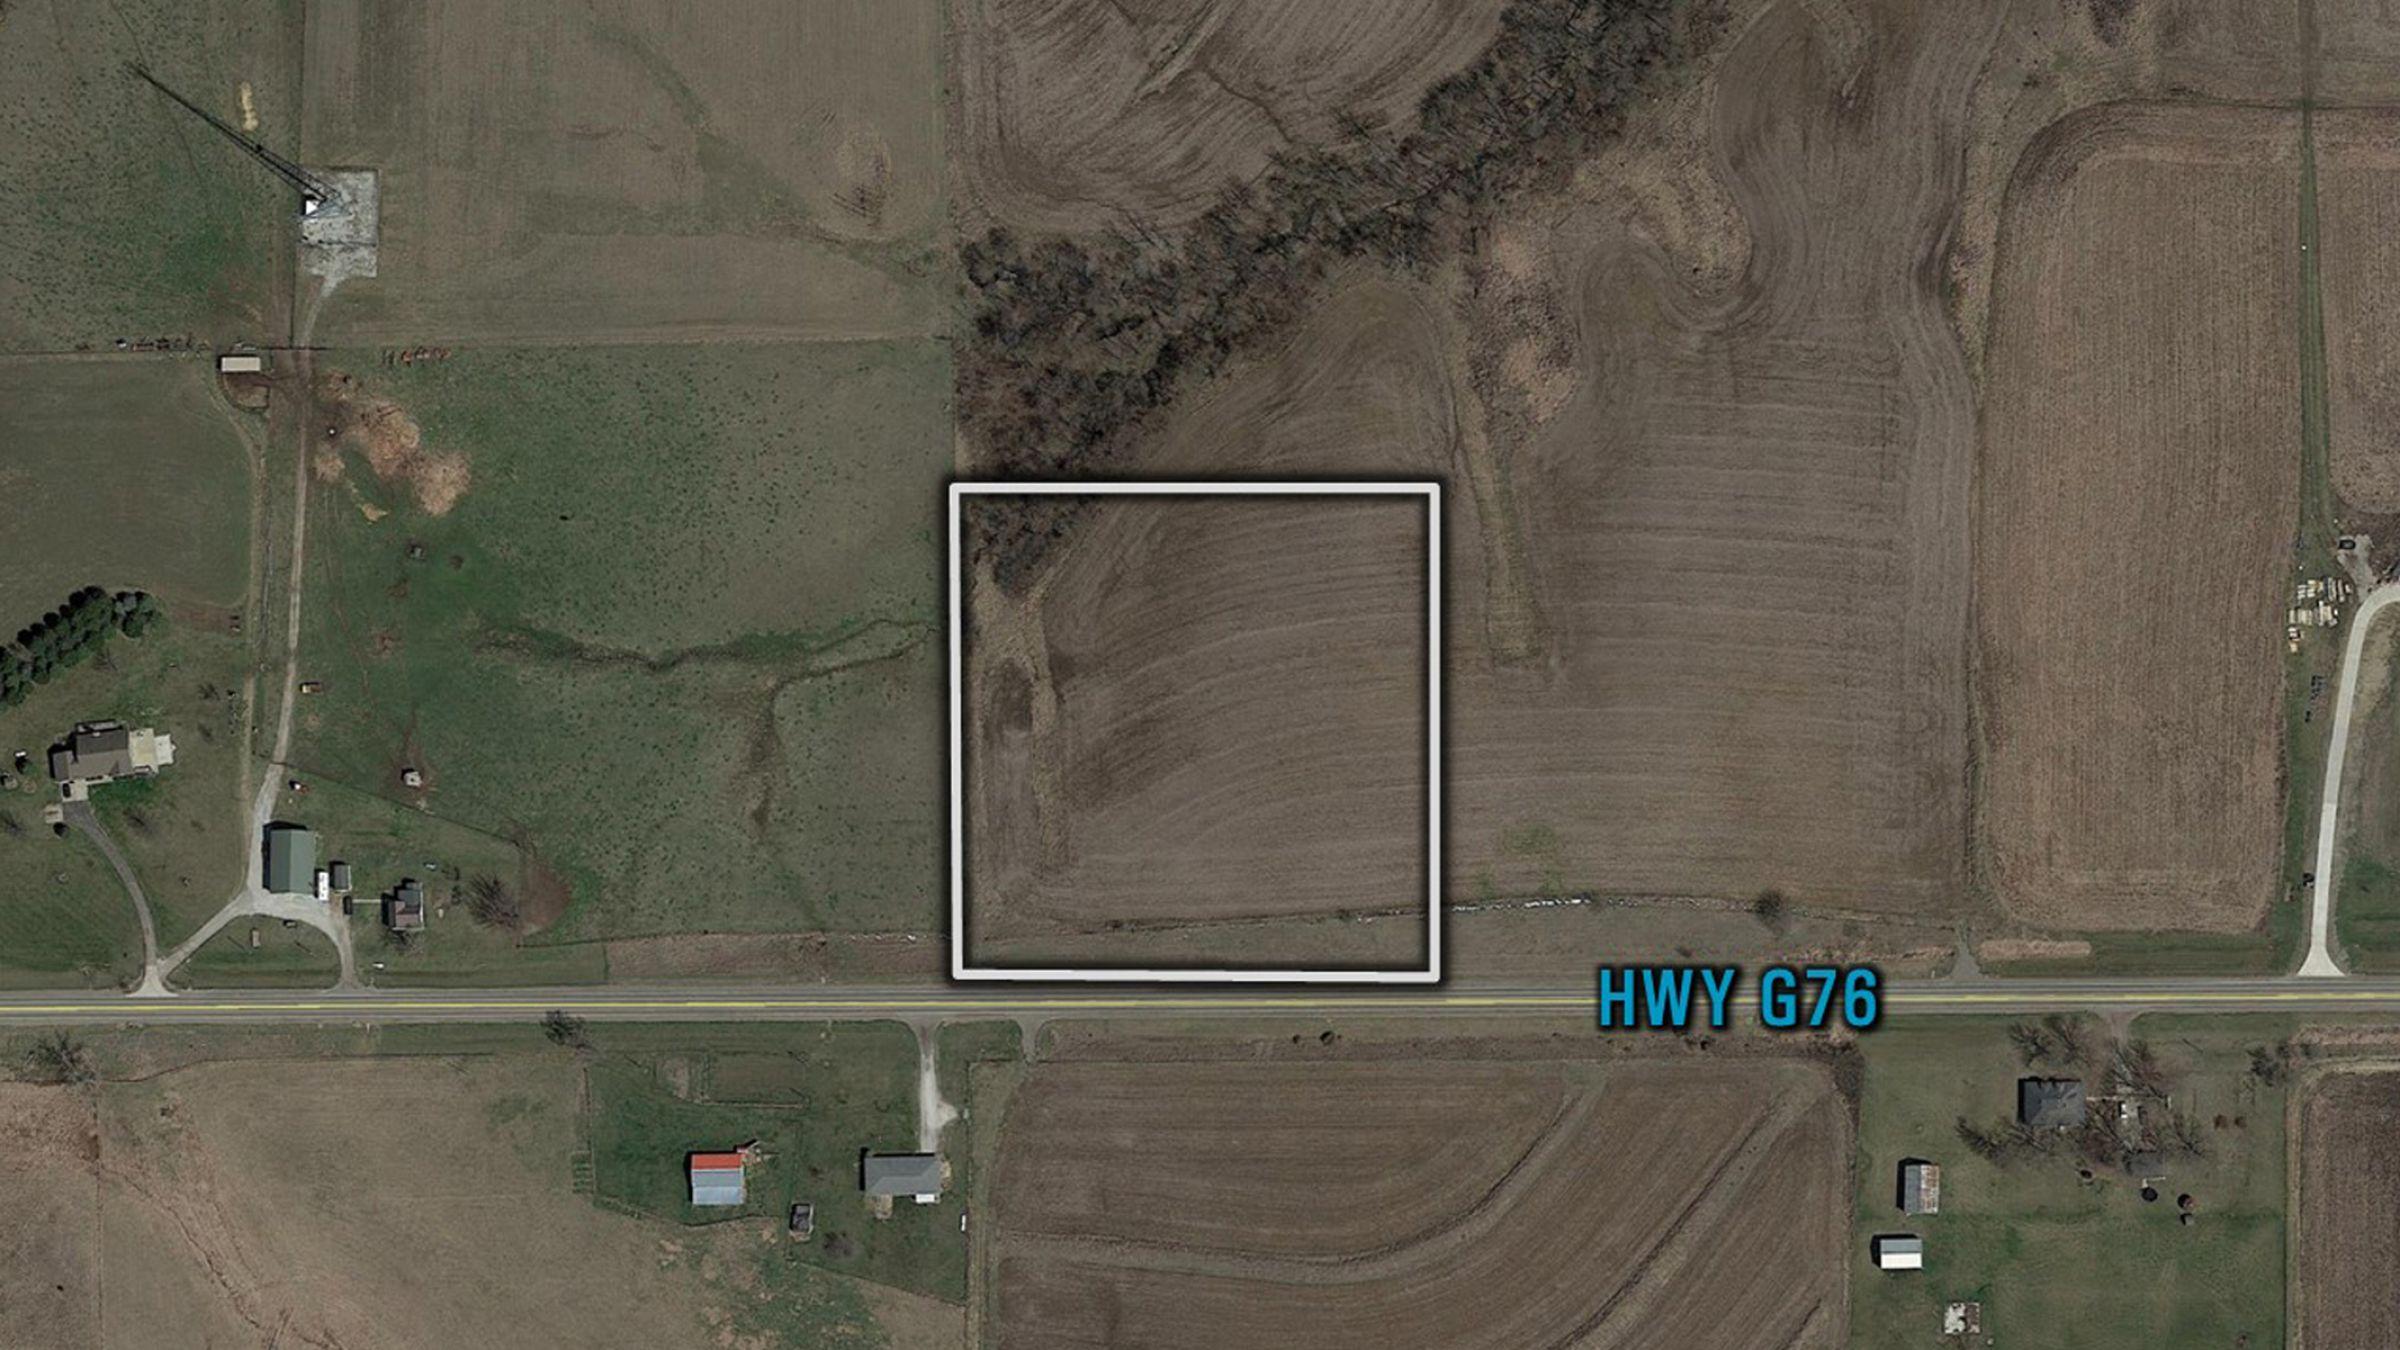 land-warren-county-iowa-5-acres-listing-number-15400-0-2021-03-08-214359.jpg